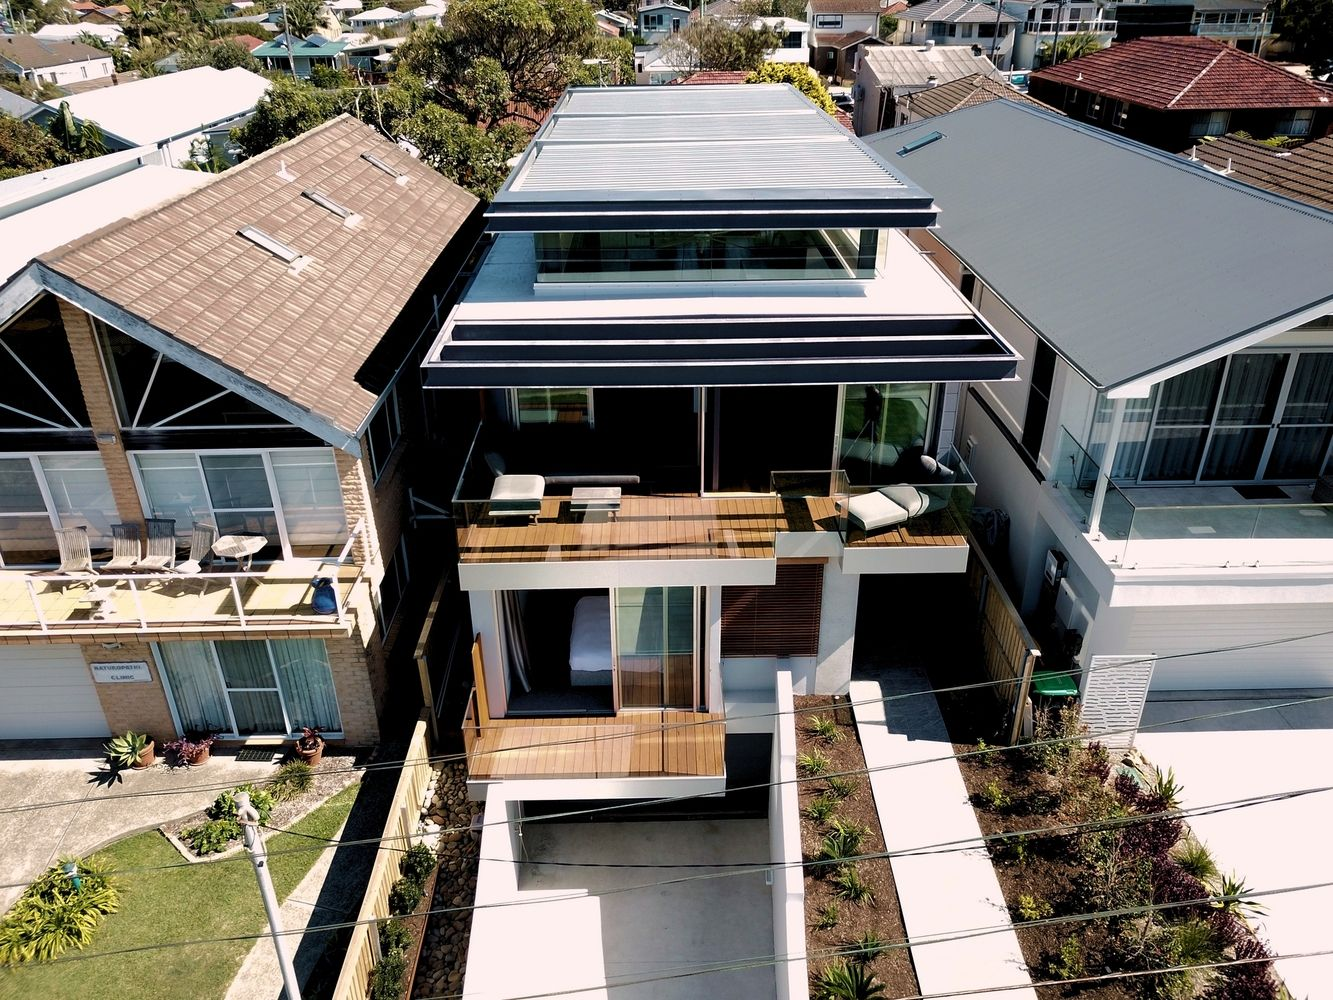 Gallery of north curl house rolf ockert design latest designs also rooftop rh pinterest